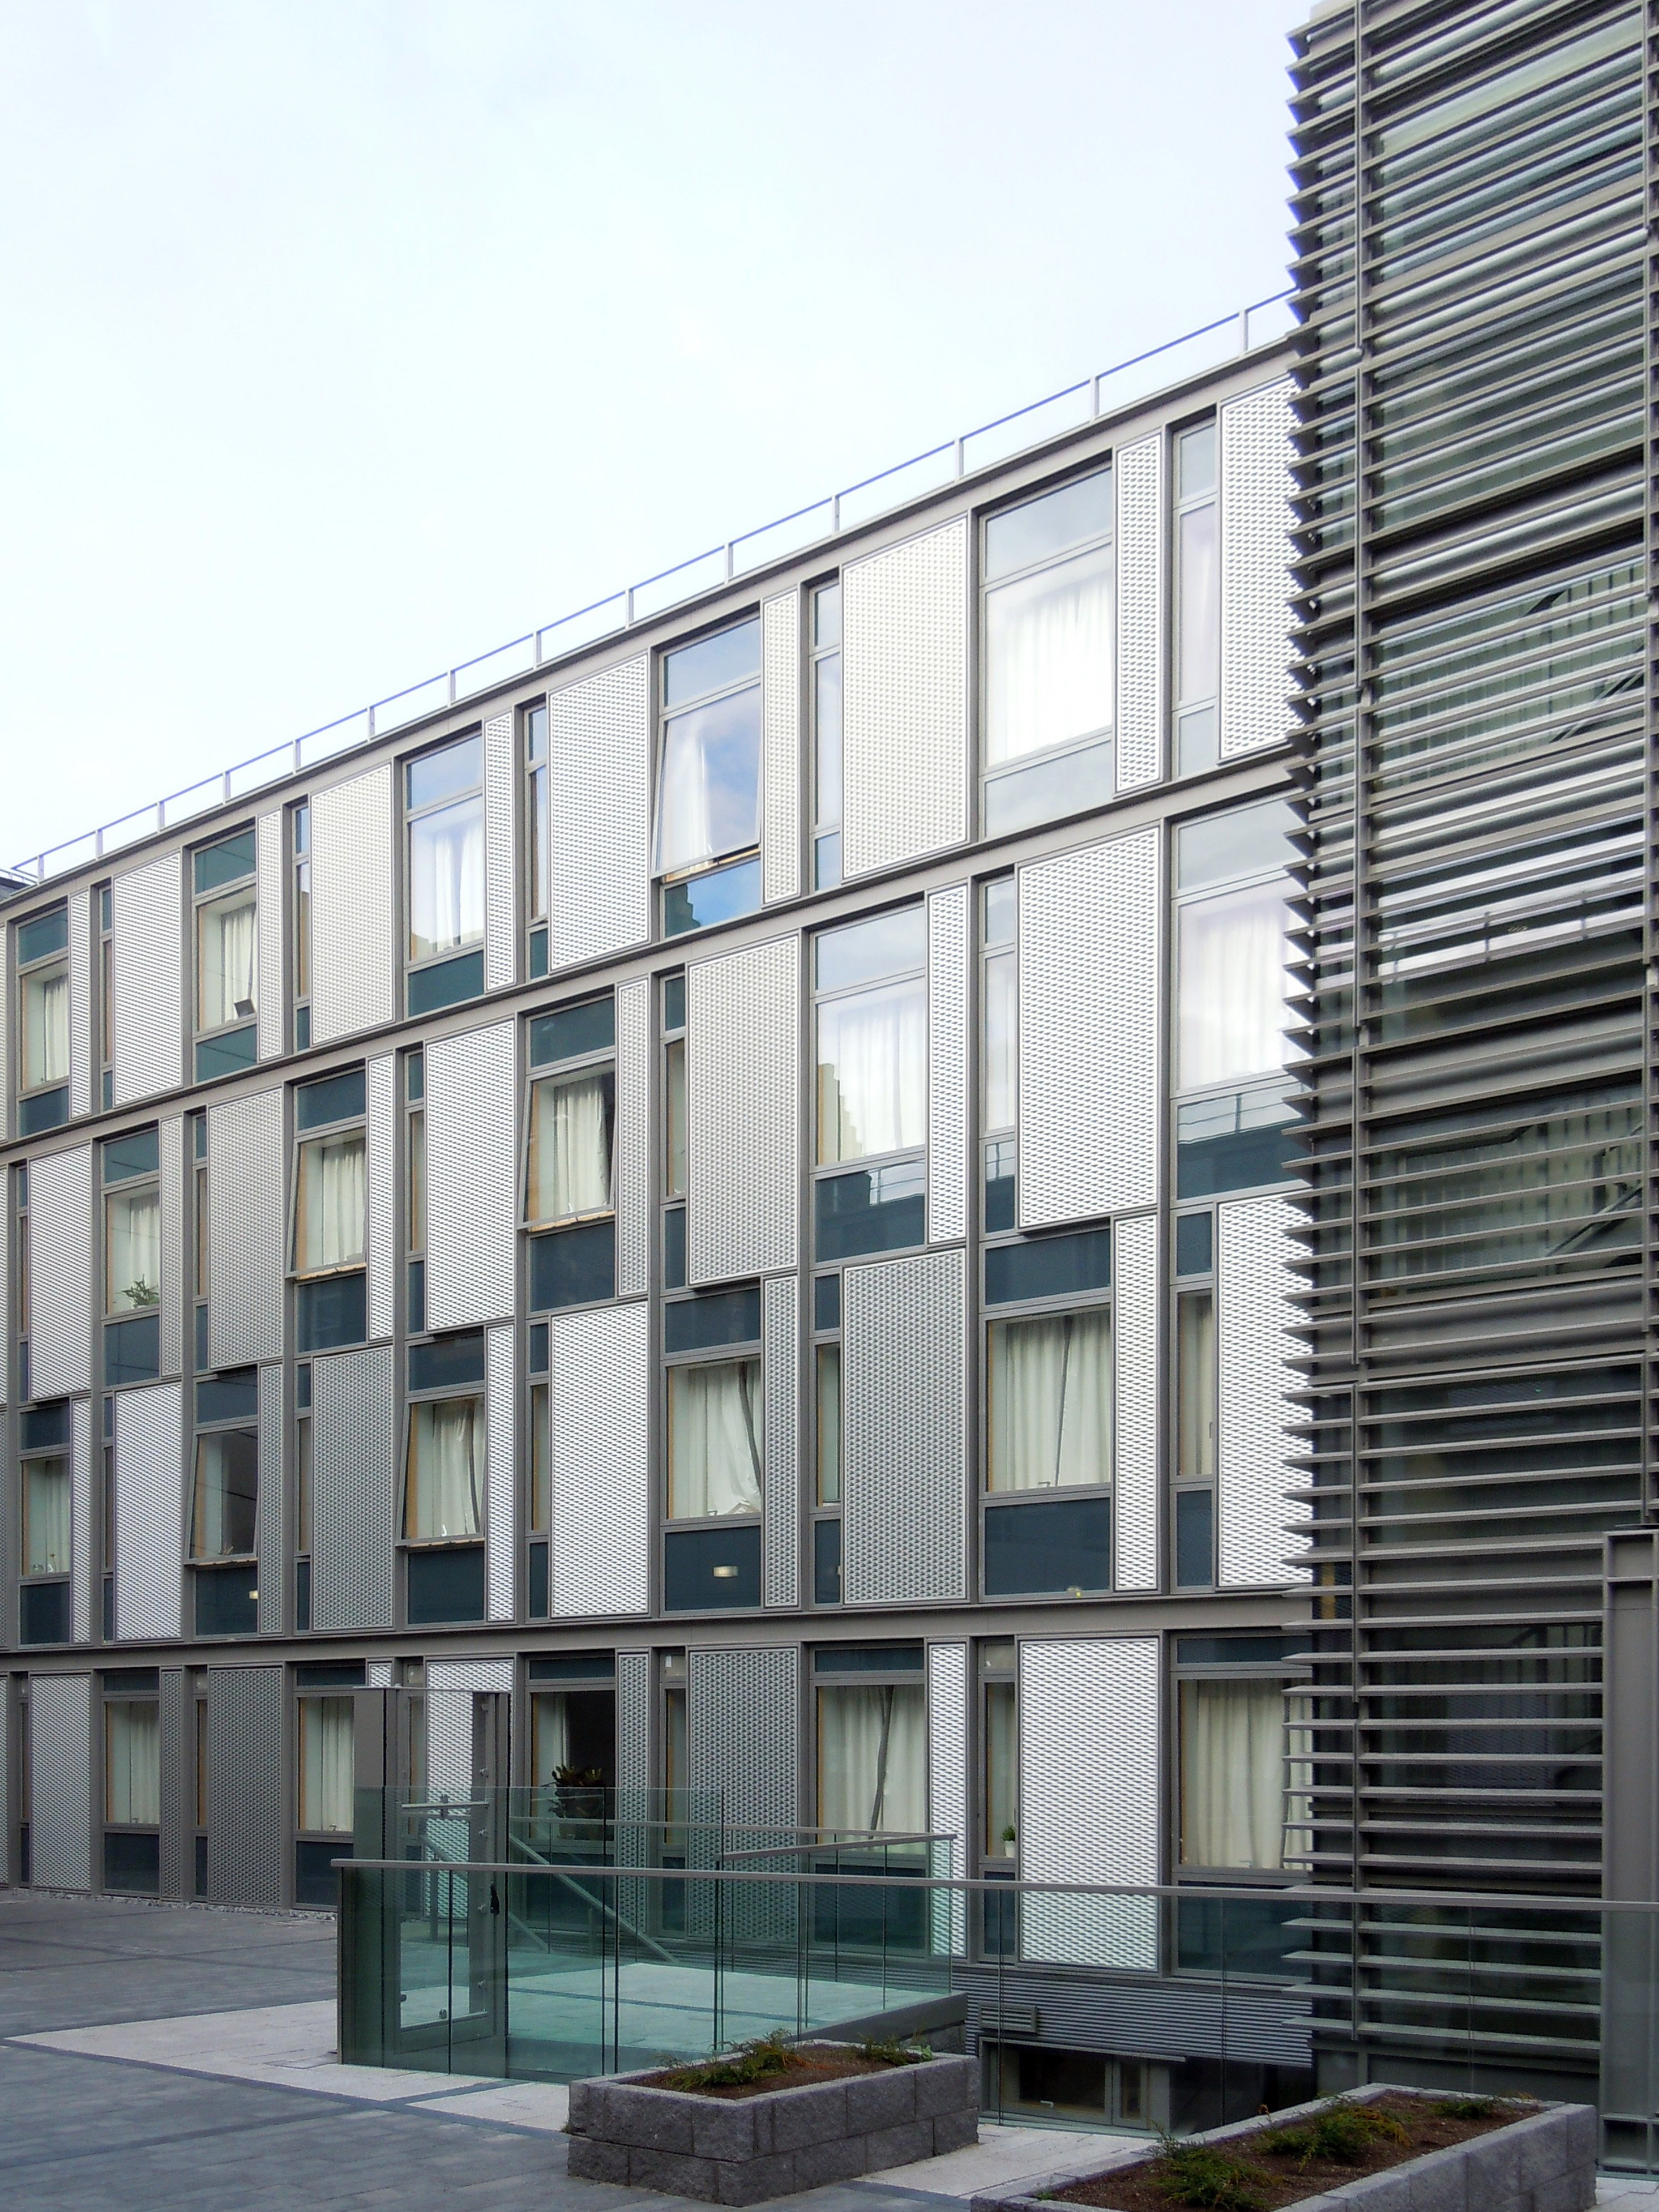 Student housing fixed by Kladfix